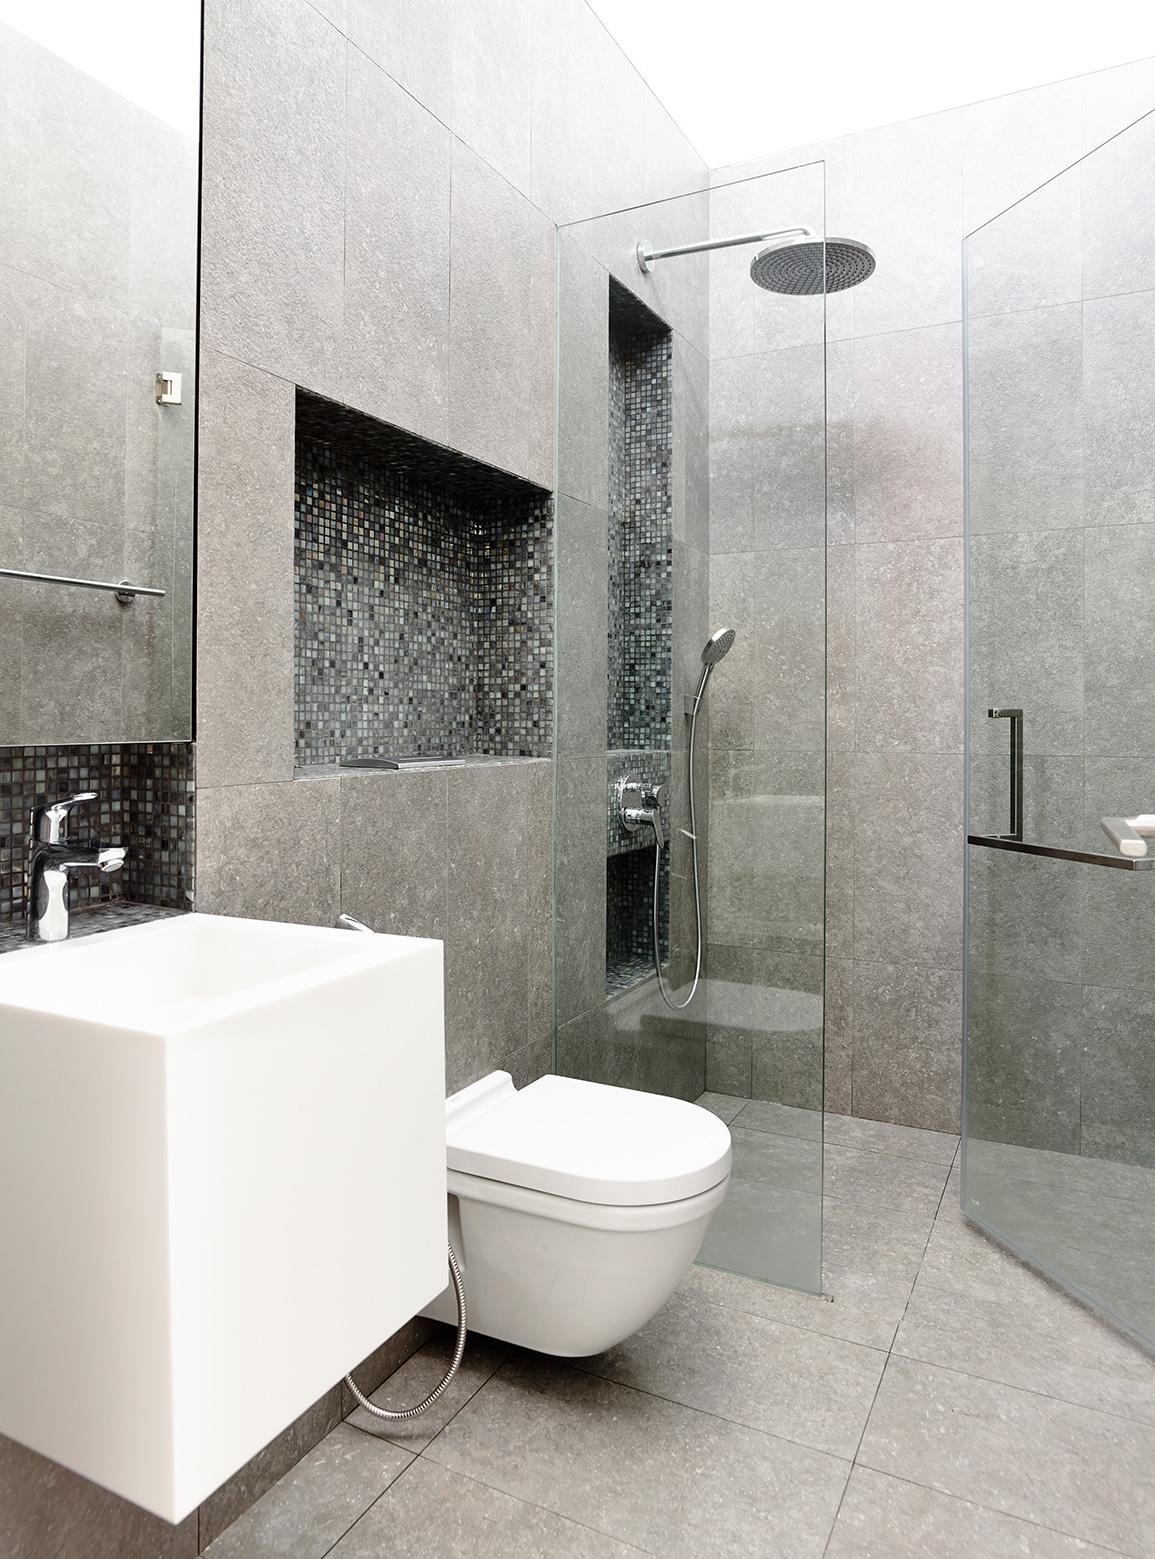 Planos de casa angosta y larga tres pisos construye hogar - Banos con estilo moderno ...